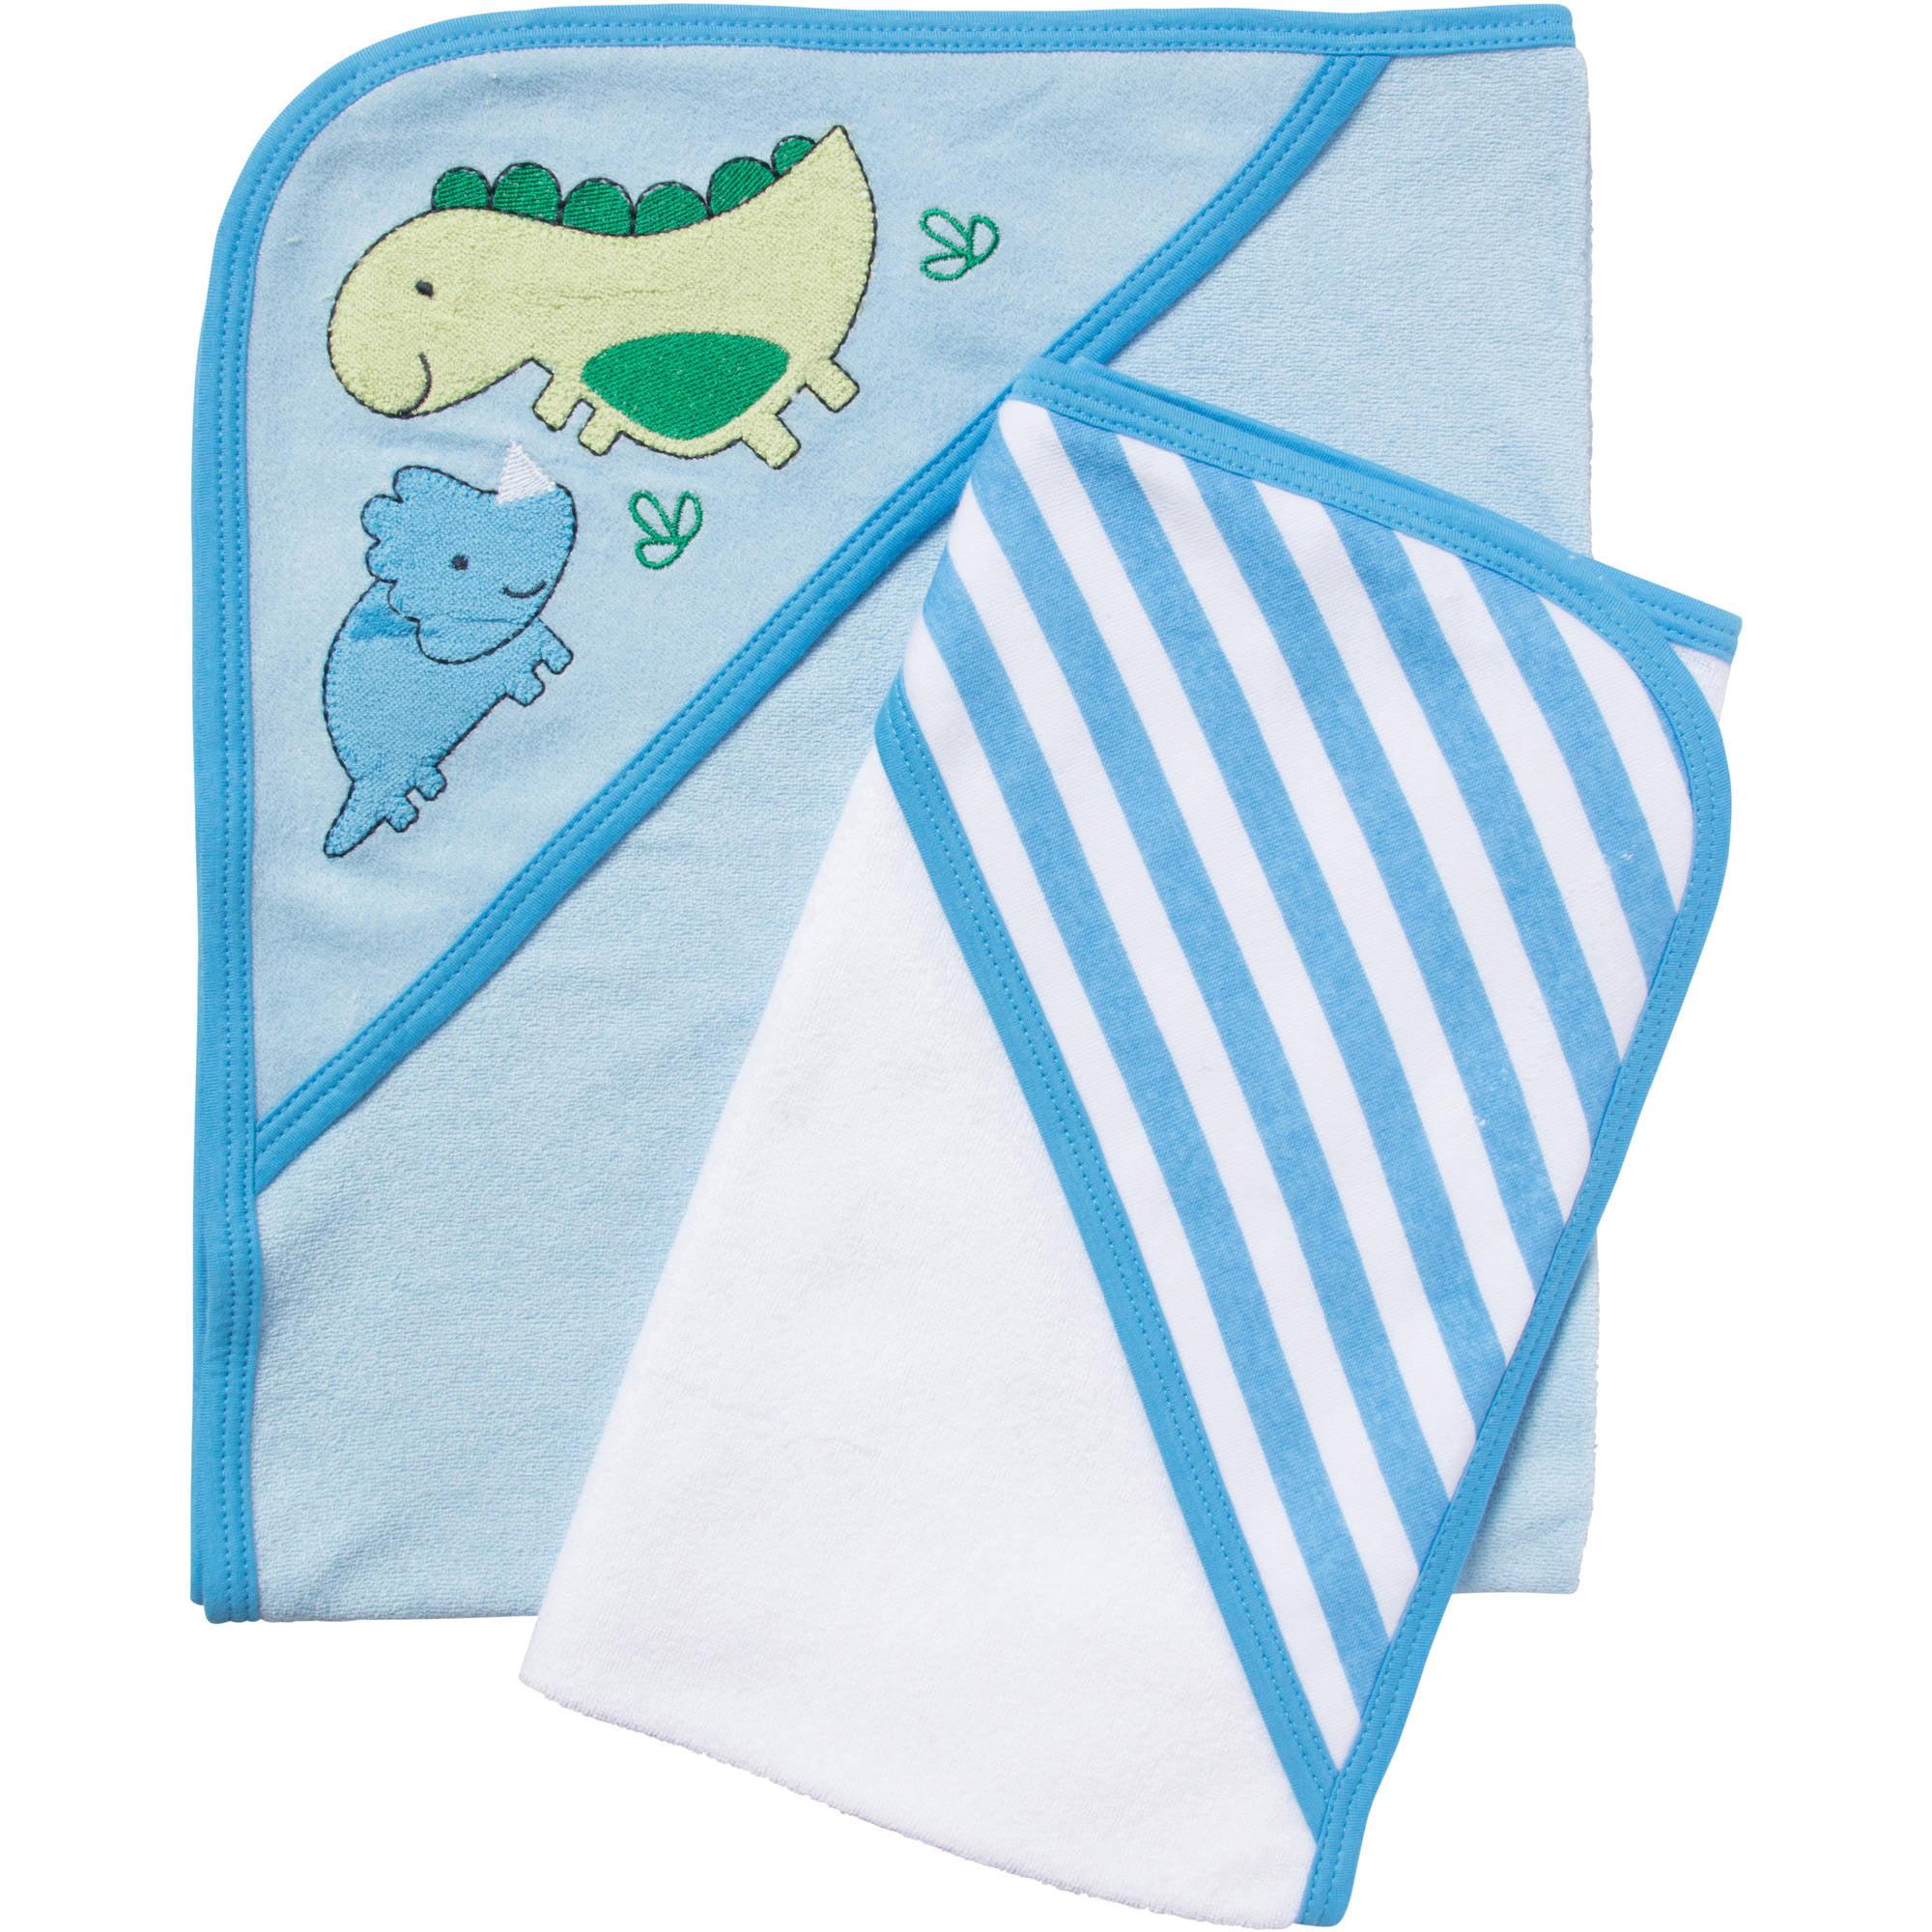 Gerber 2pk Hooded Towels Boy Dino - Walmart.com